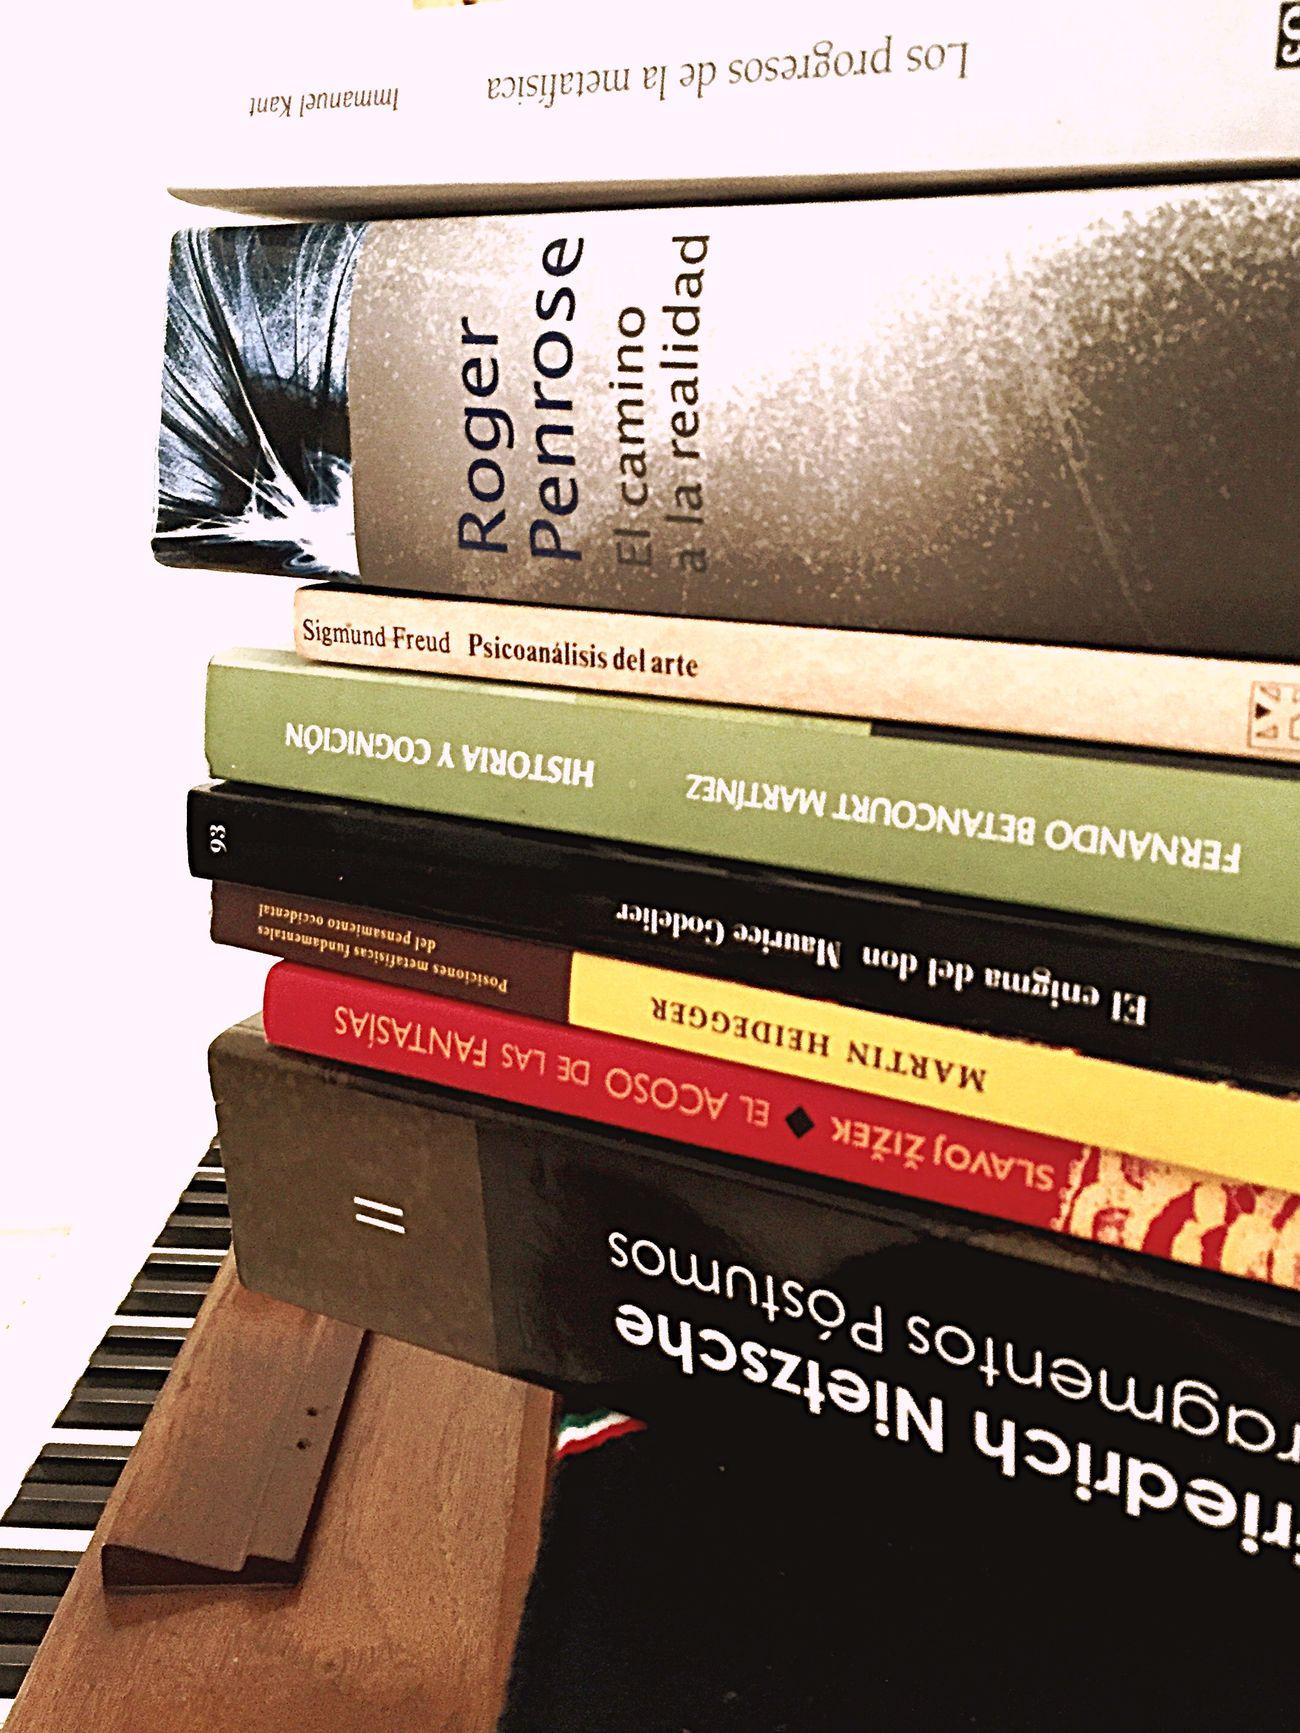 Books Complexity Piano Music Philosofy Read Inglés (null)Photography Freud Nietzsche Kant Heidegger Slavoj Betancourd